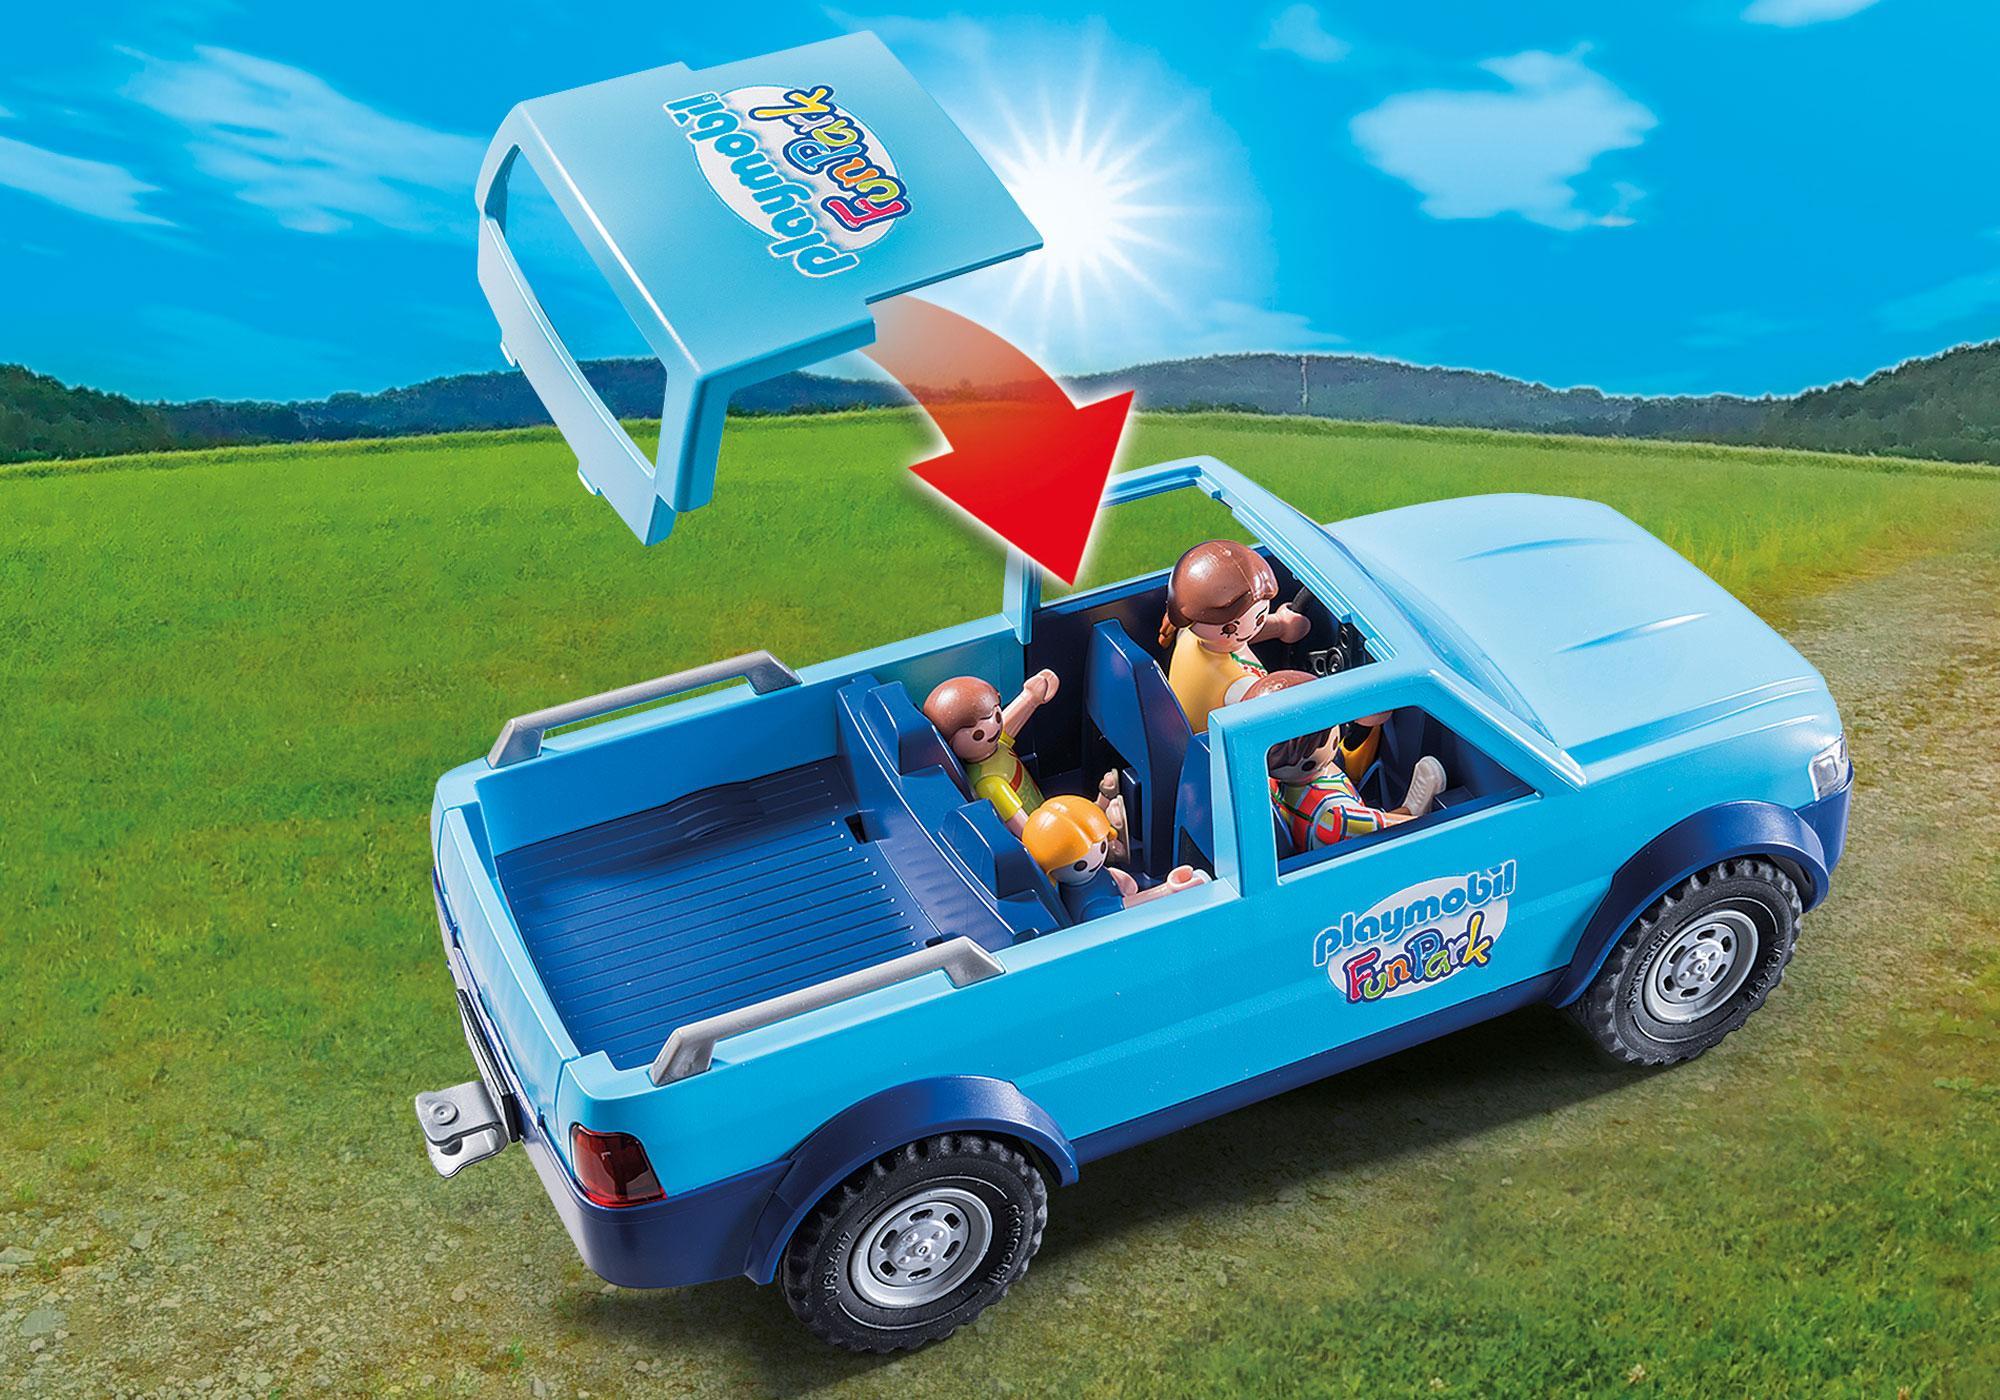 http://media.playmobil.com/i/playmobil/9502_product_extra1/PLAYMOBIL-FunPark Pick-Up mit Wohnwagen